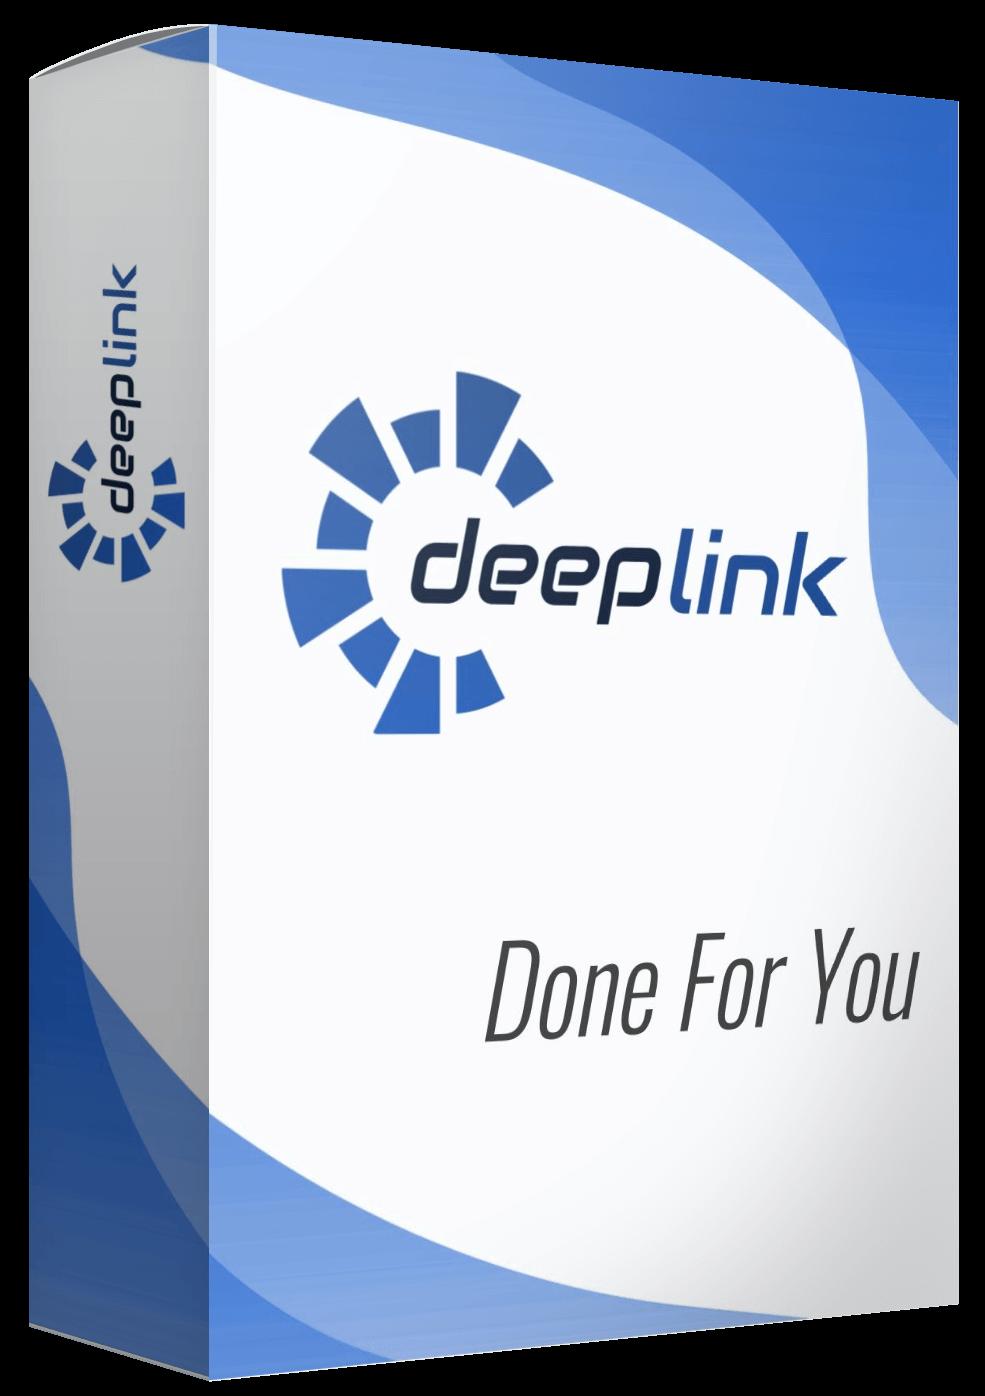 DeepLink-oto-2